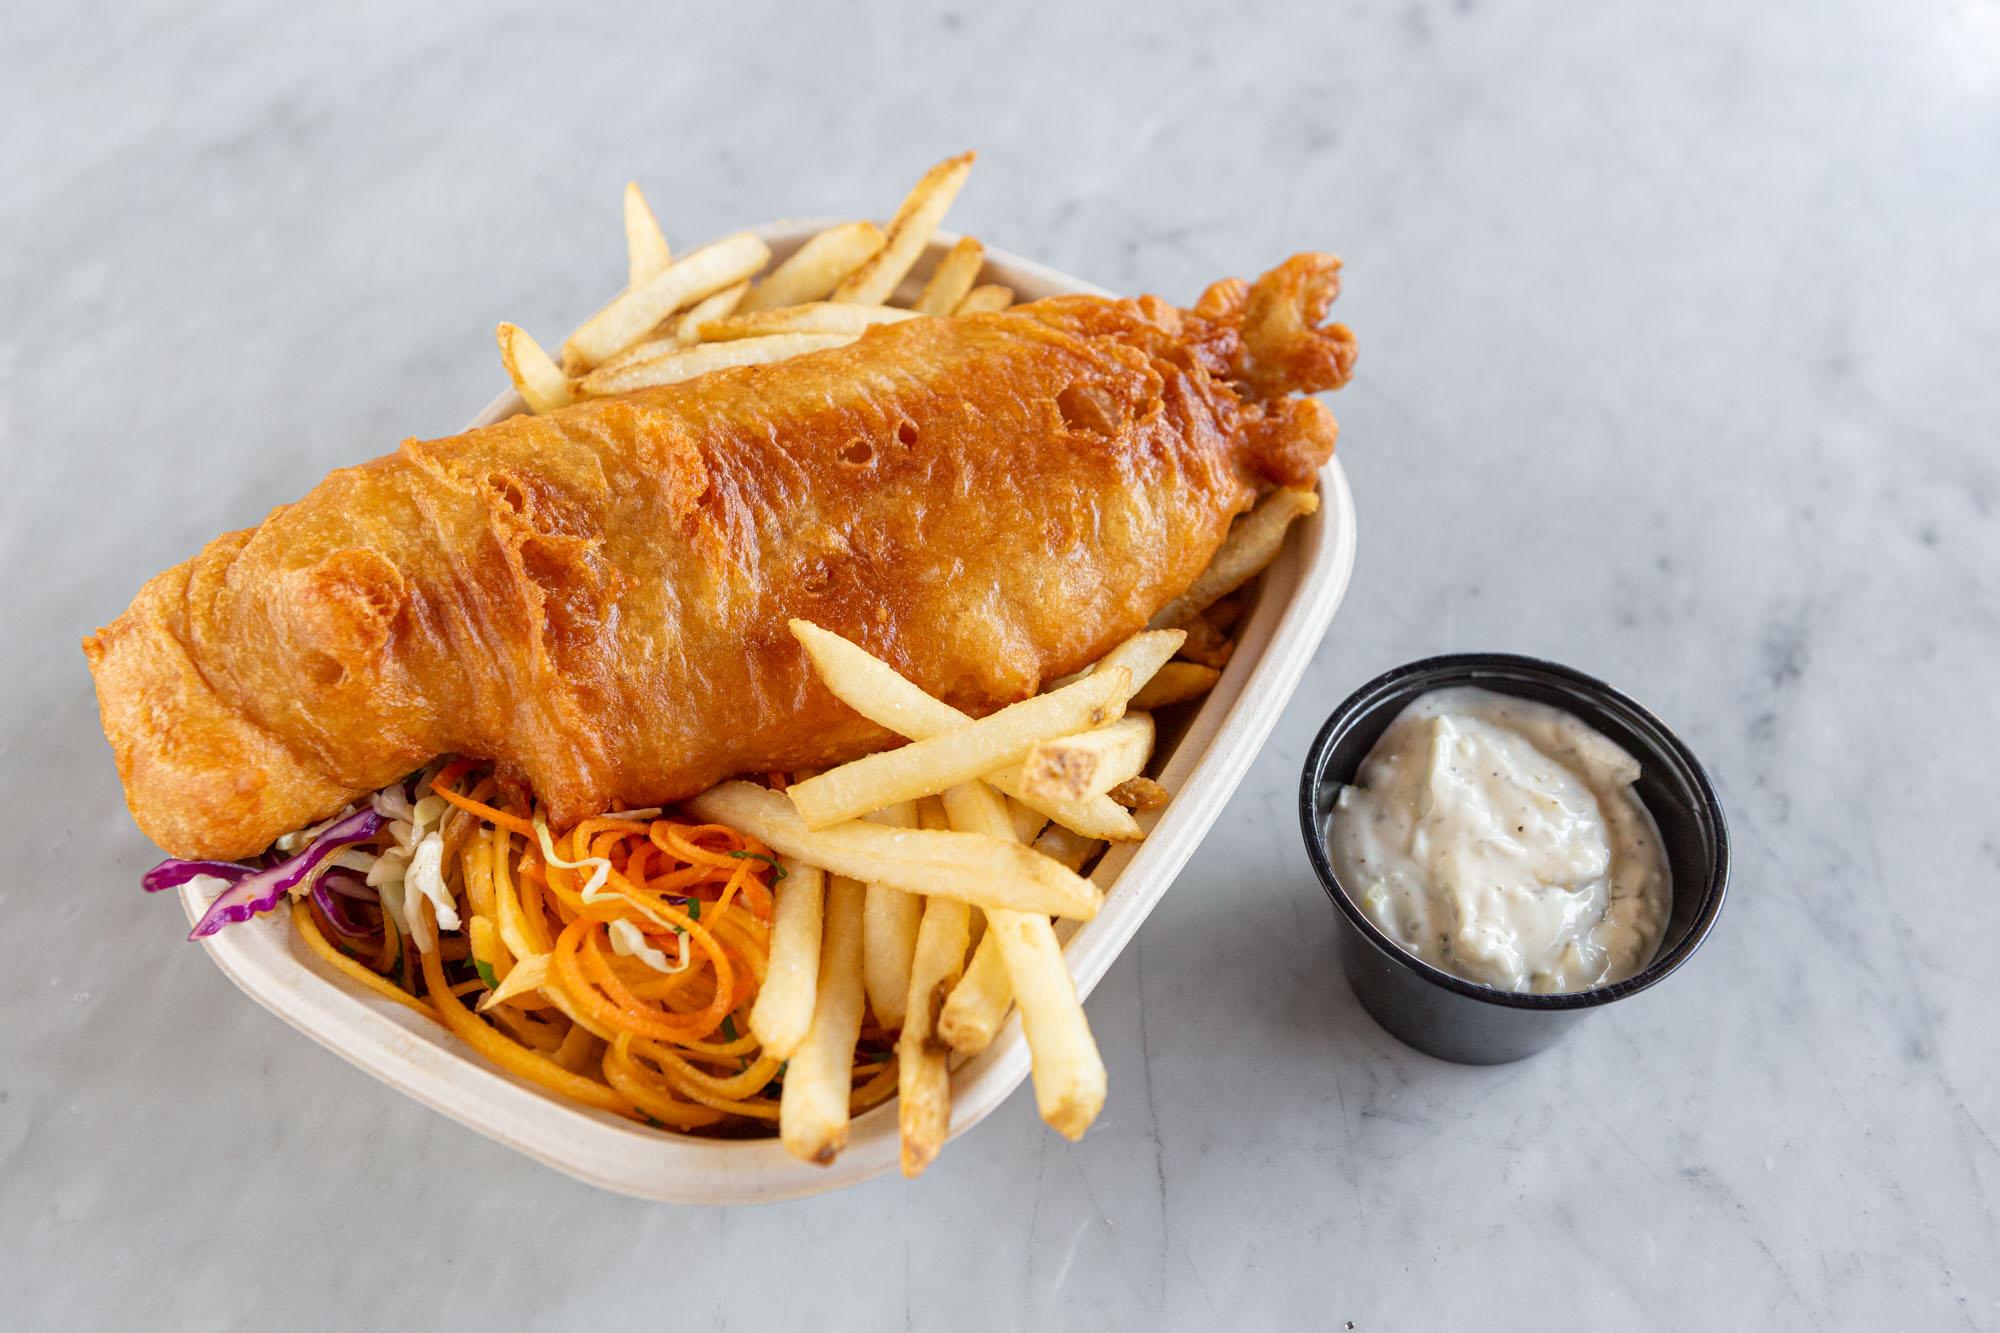 Luma's Fish and Chips